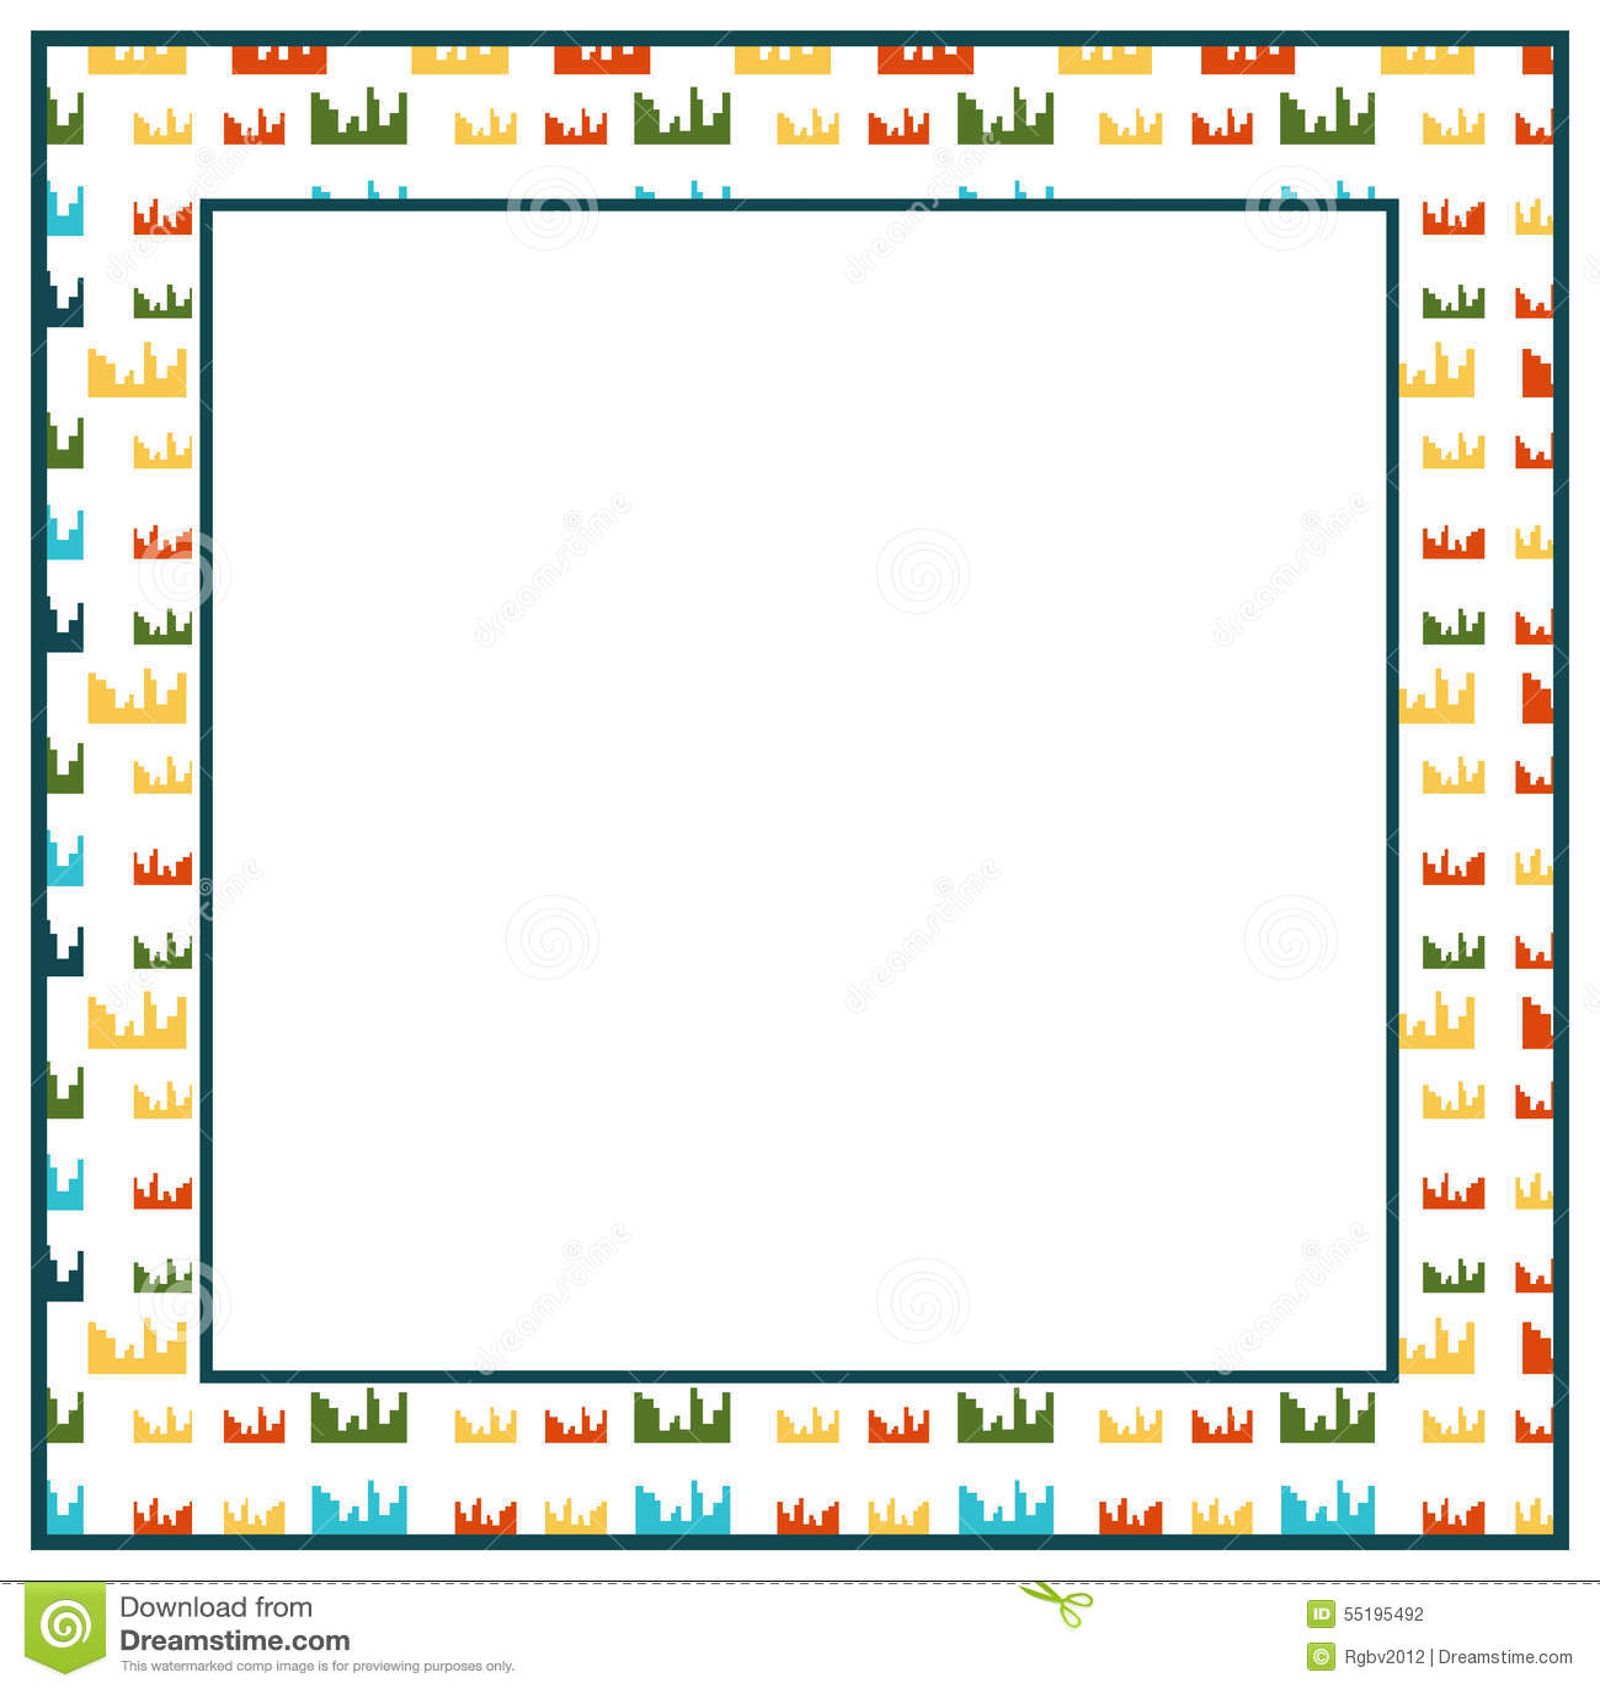 City frame stock vector. Illustration of wallpaper, pattern - 55195492